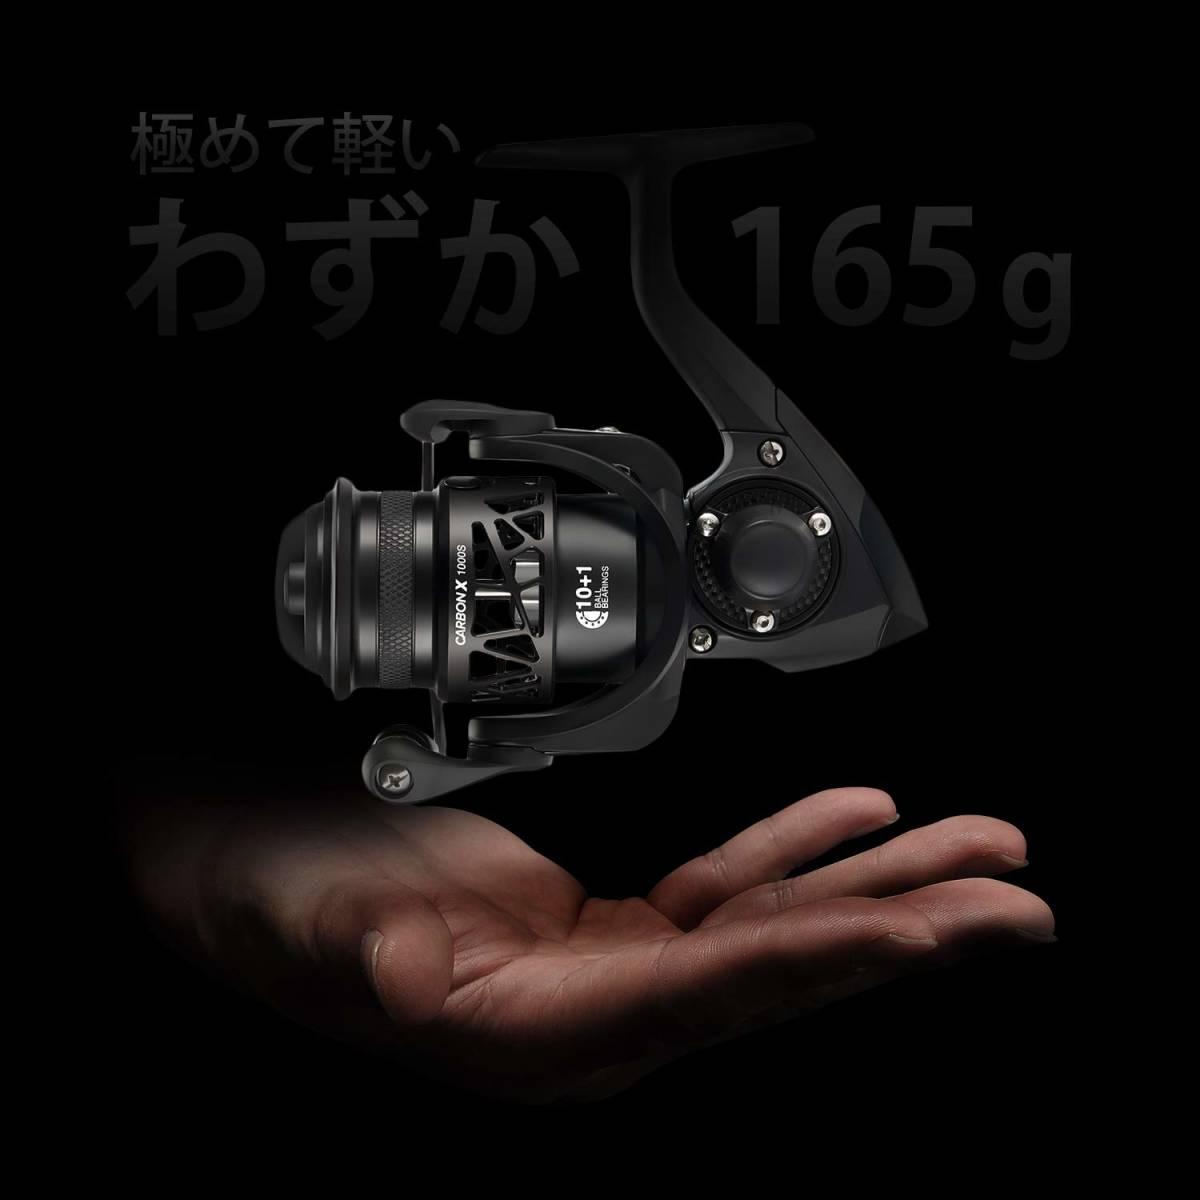 1000S番 ピシファン(Piscifun)スピニングリール CarbonX 超軽量165g 淡水釣り海釣り ギア比5.2:1/_画像3